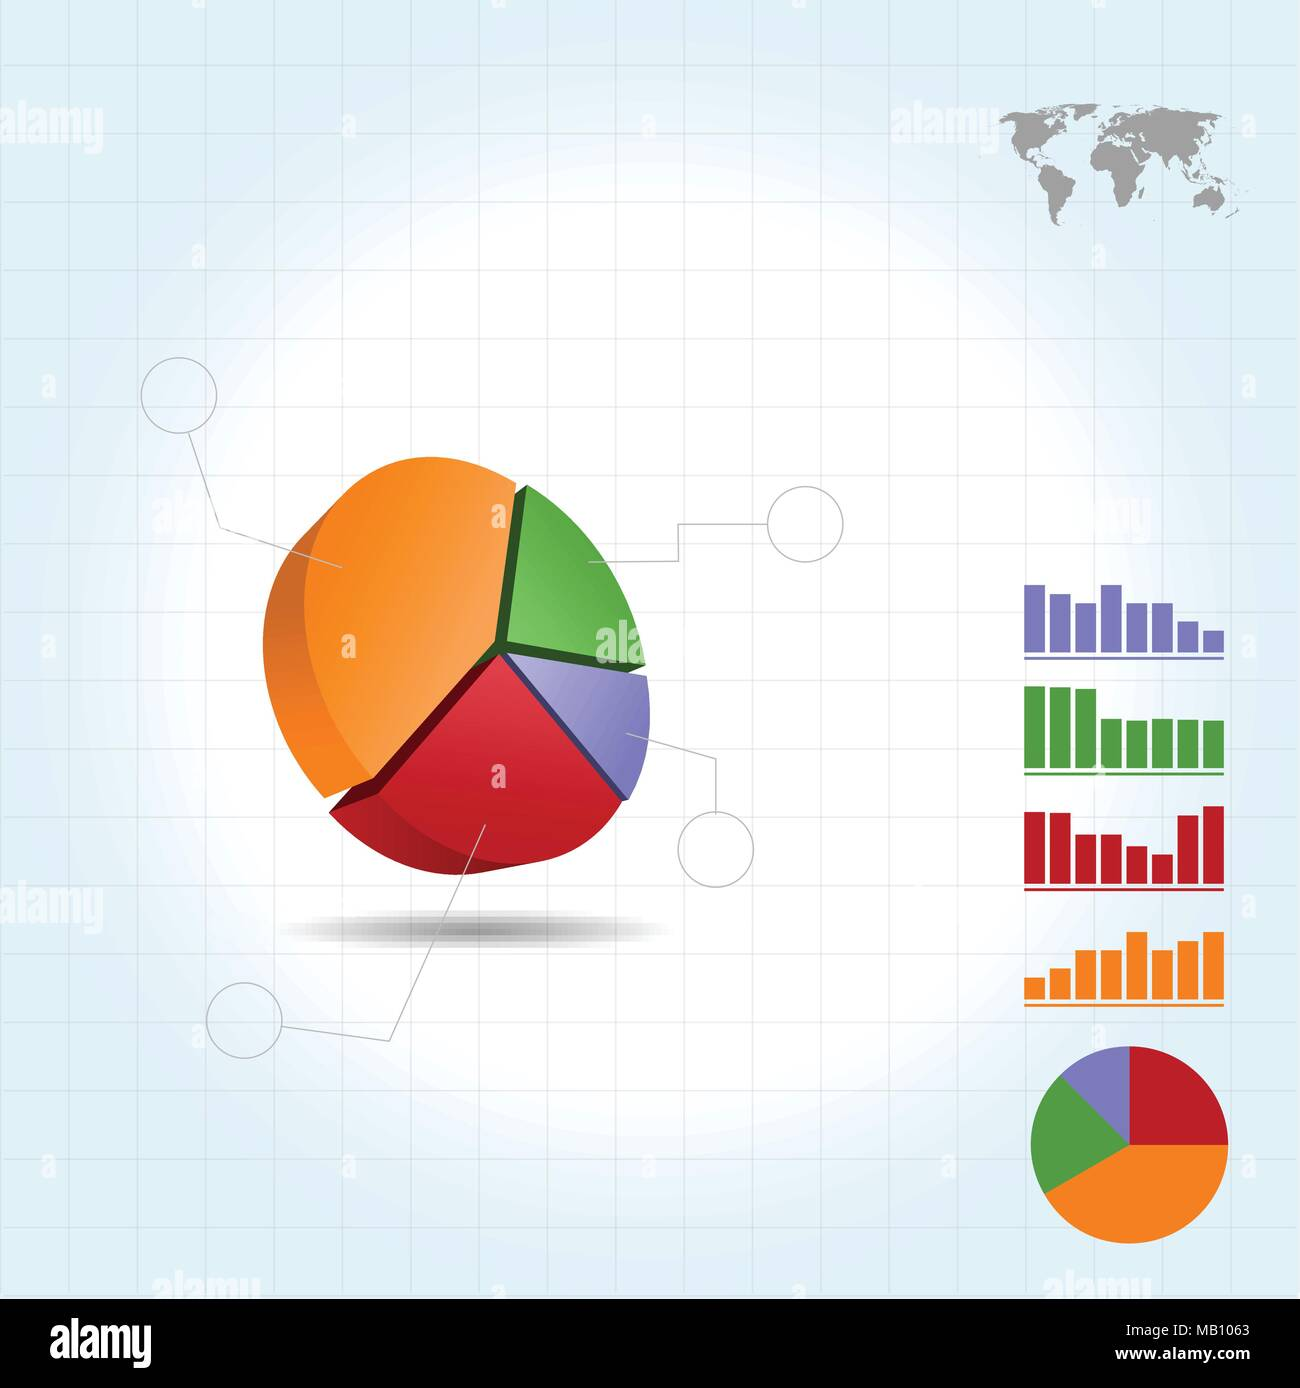 3d Pie Chart Infographic Four Points Stock Vector Art Illustration